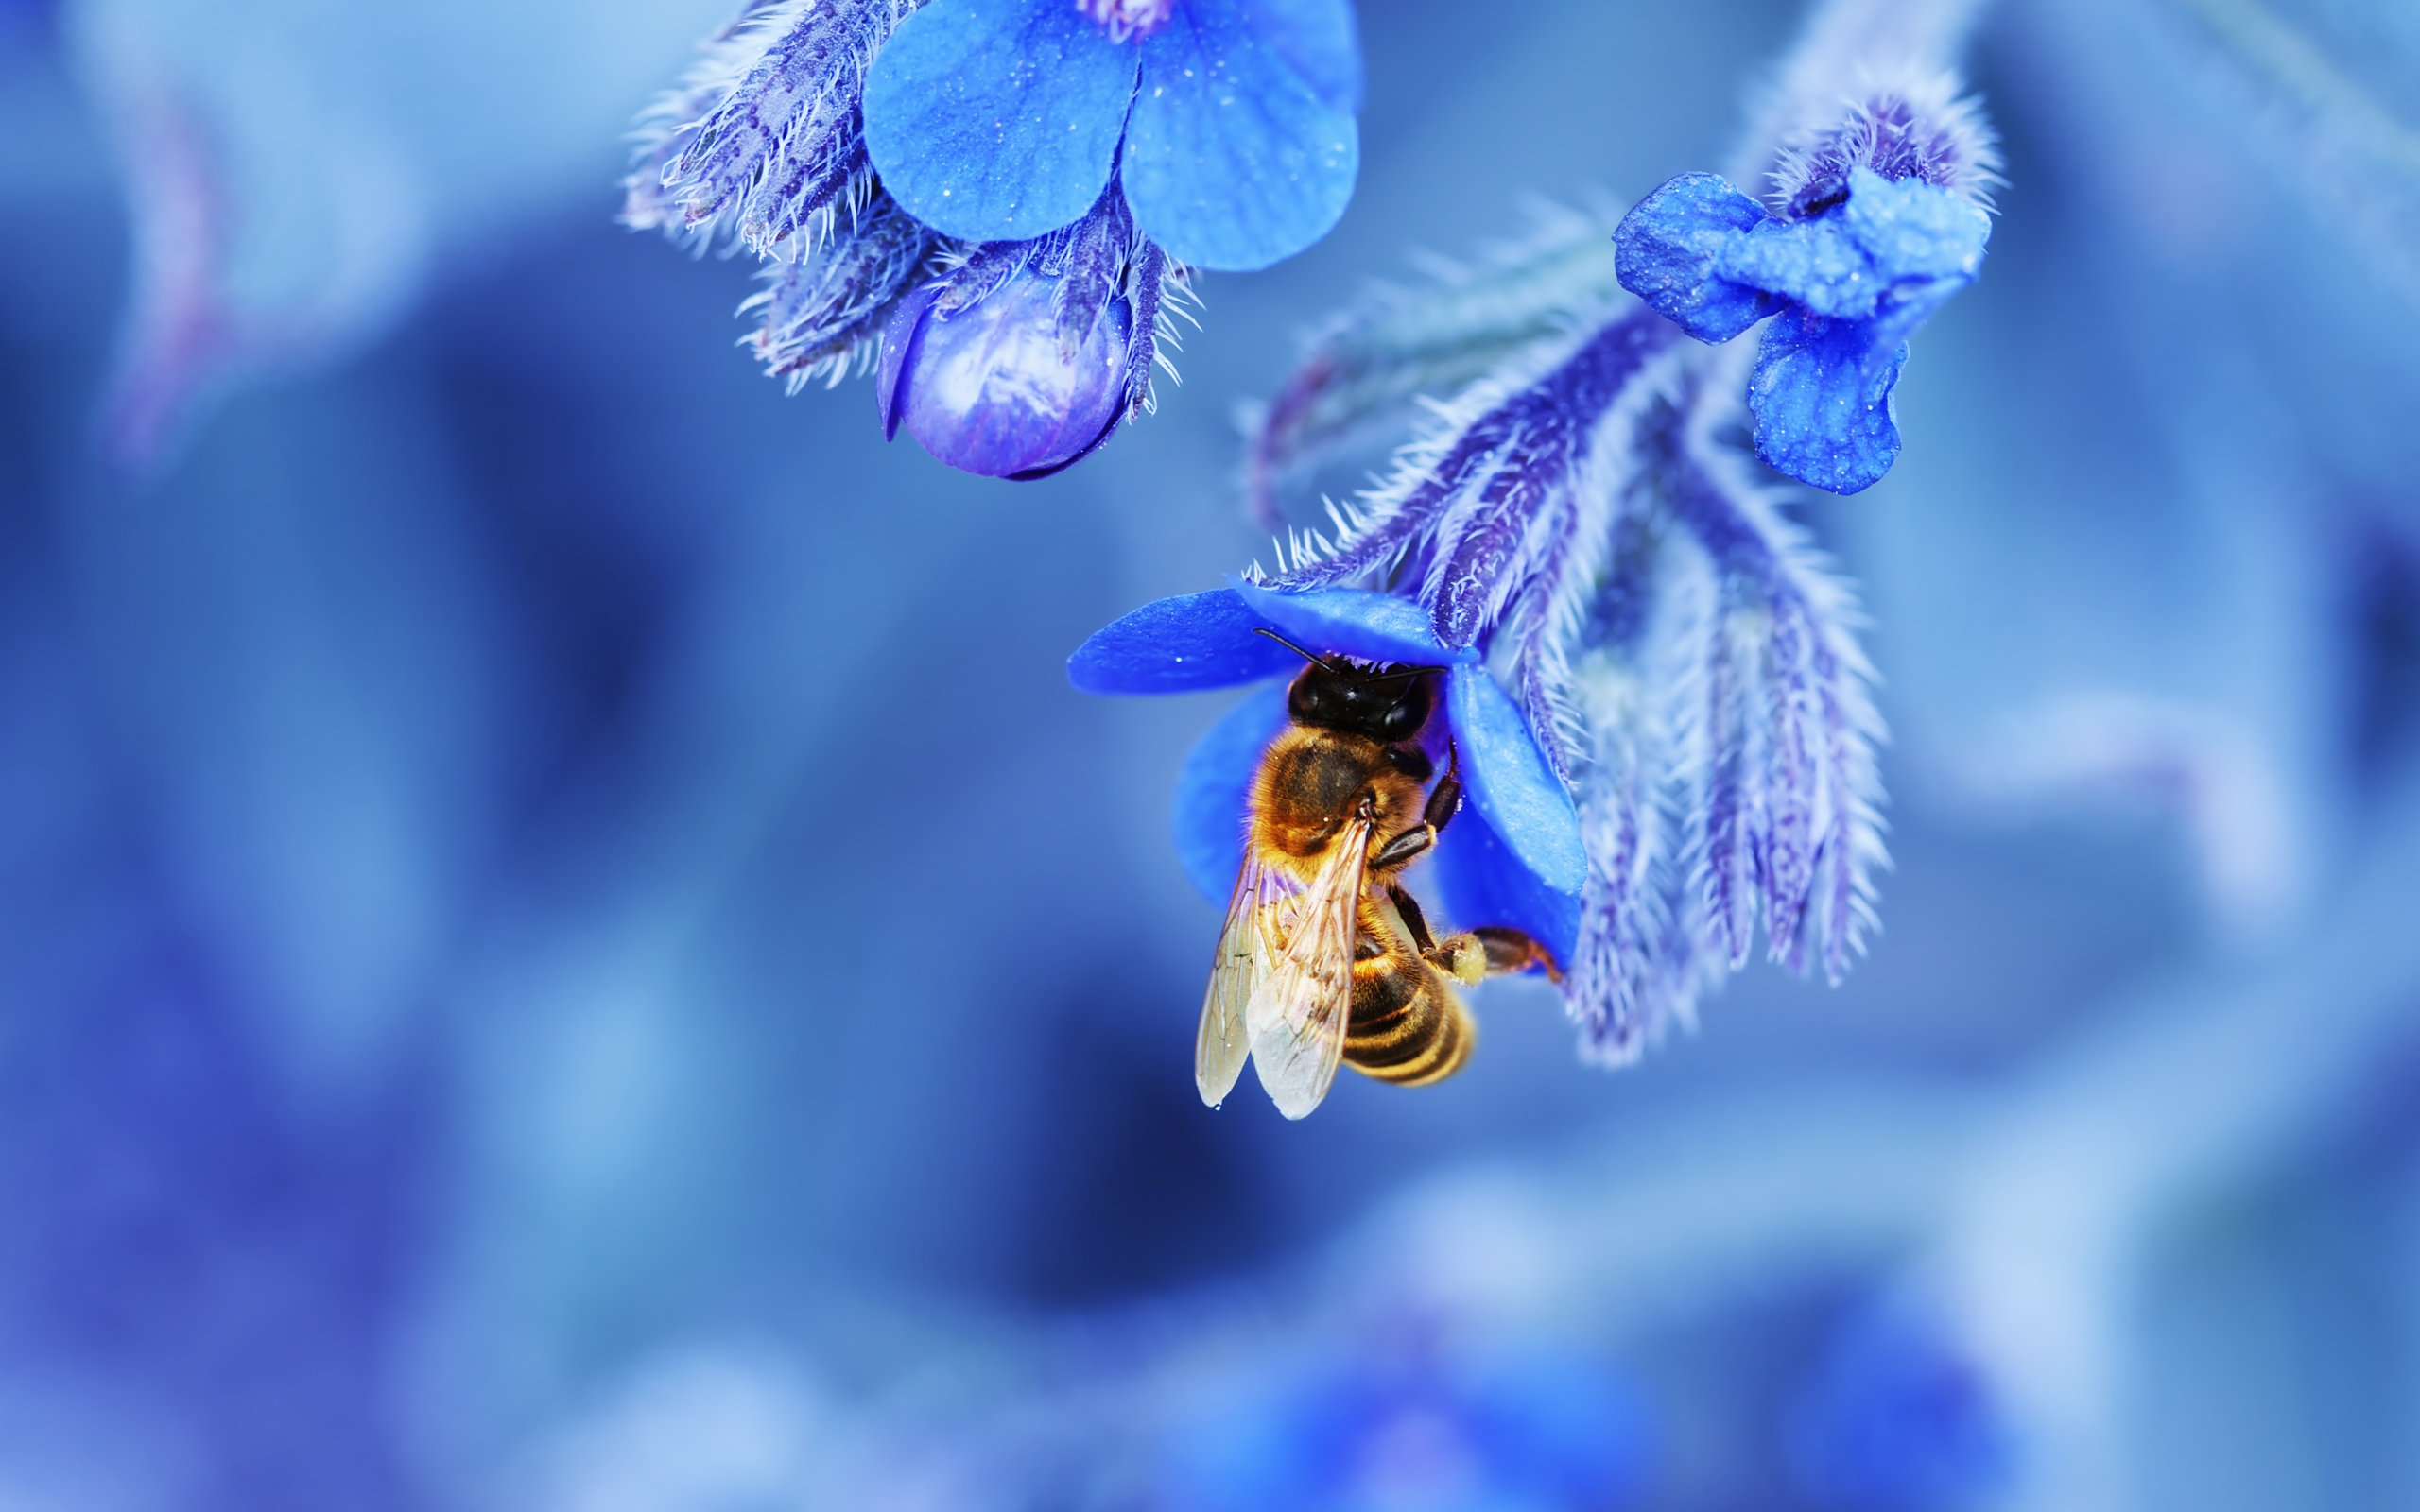 Cool Bee On Blue Flower Wallpaper 12919 Wallpaper WallpaperLepi 2560x1600